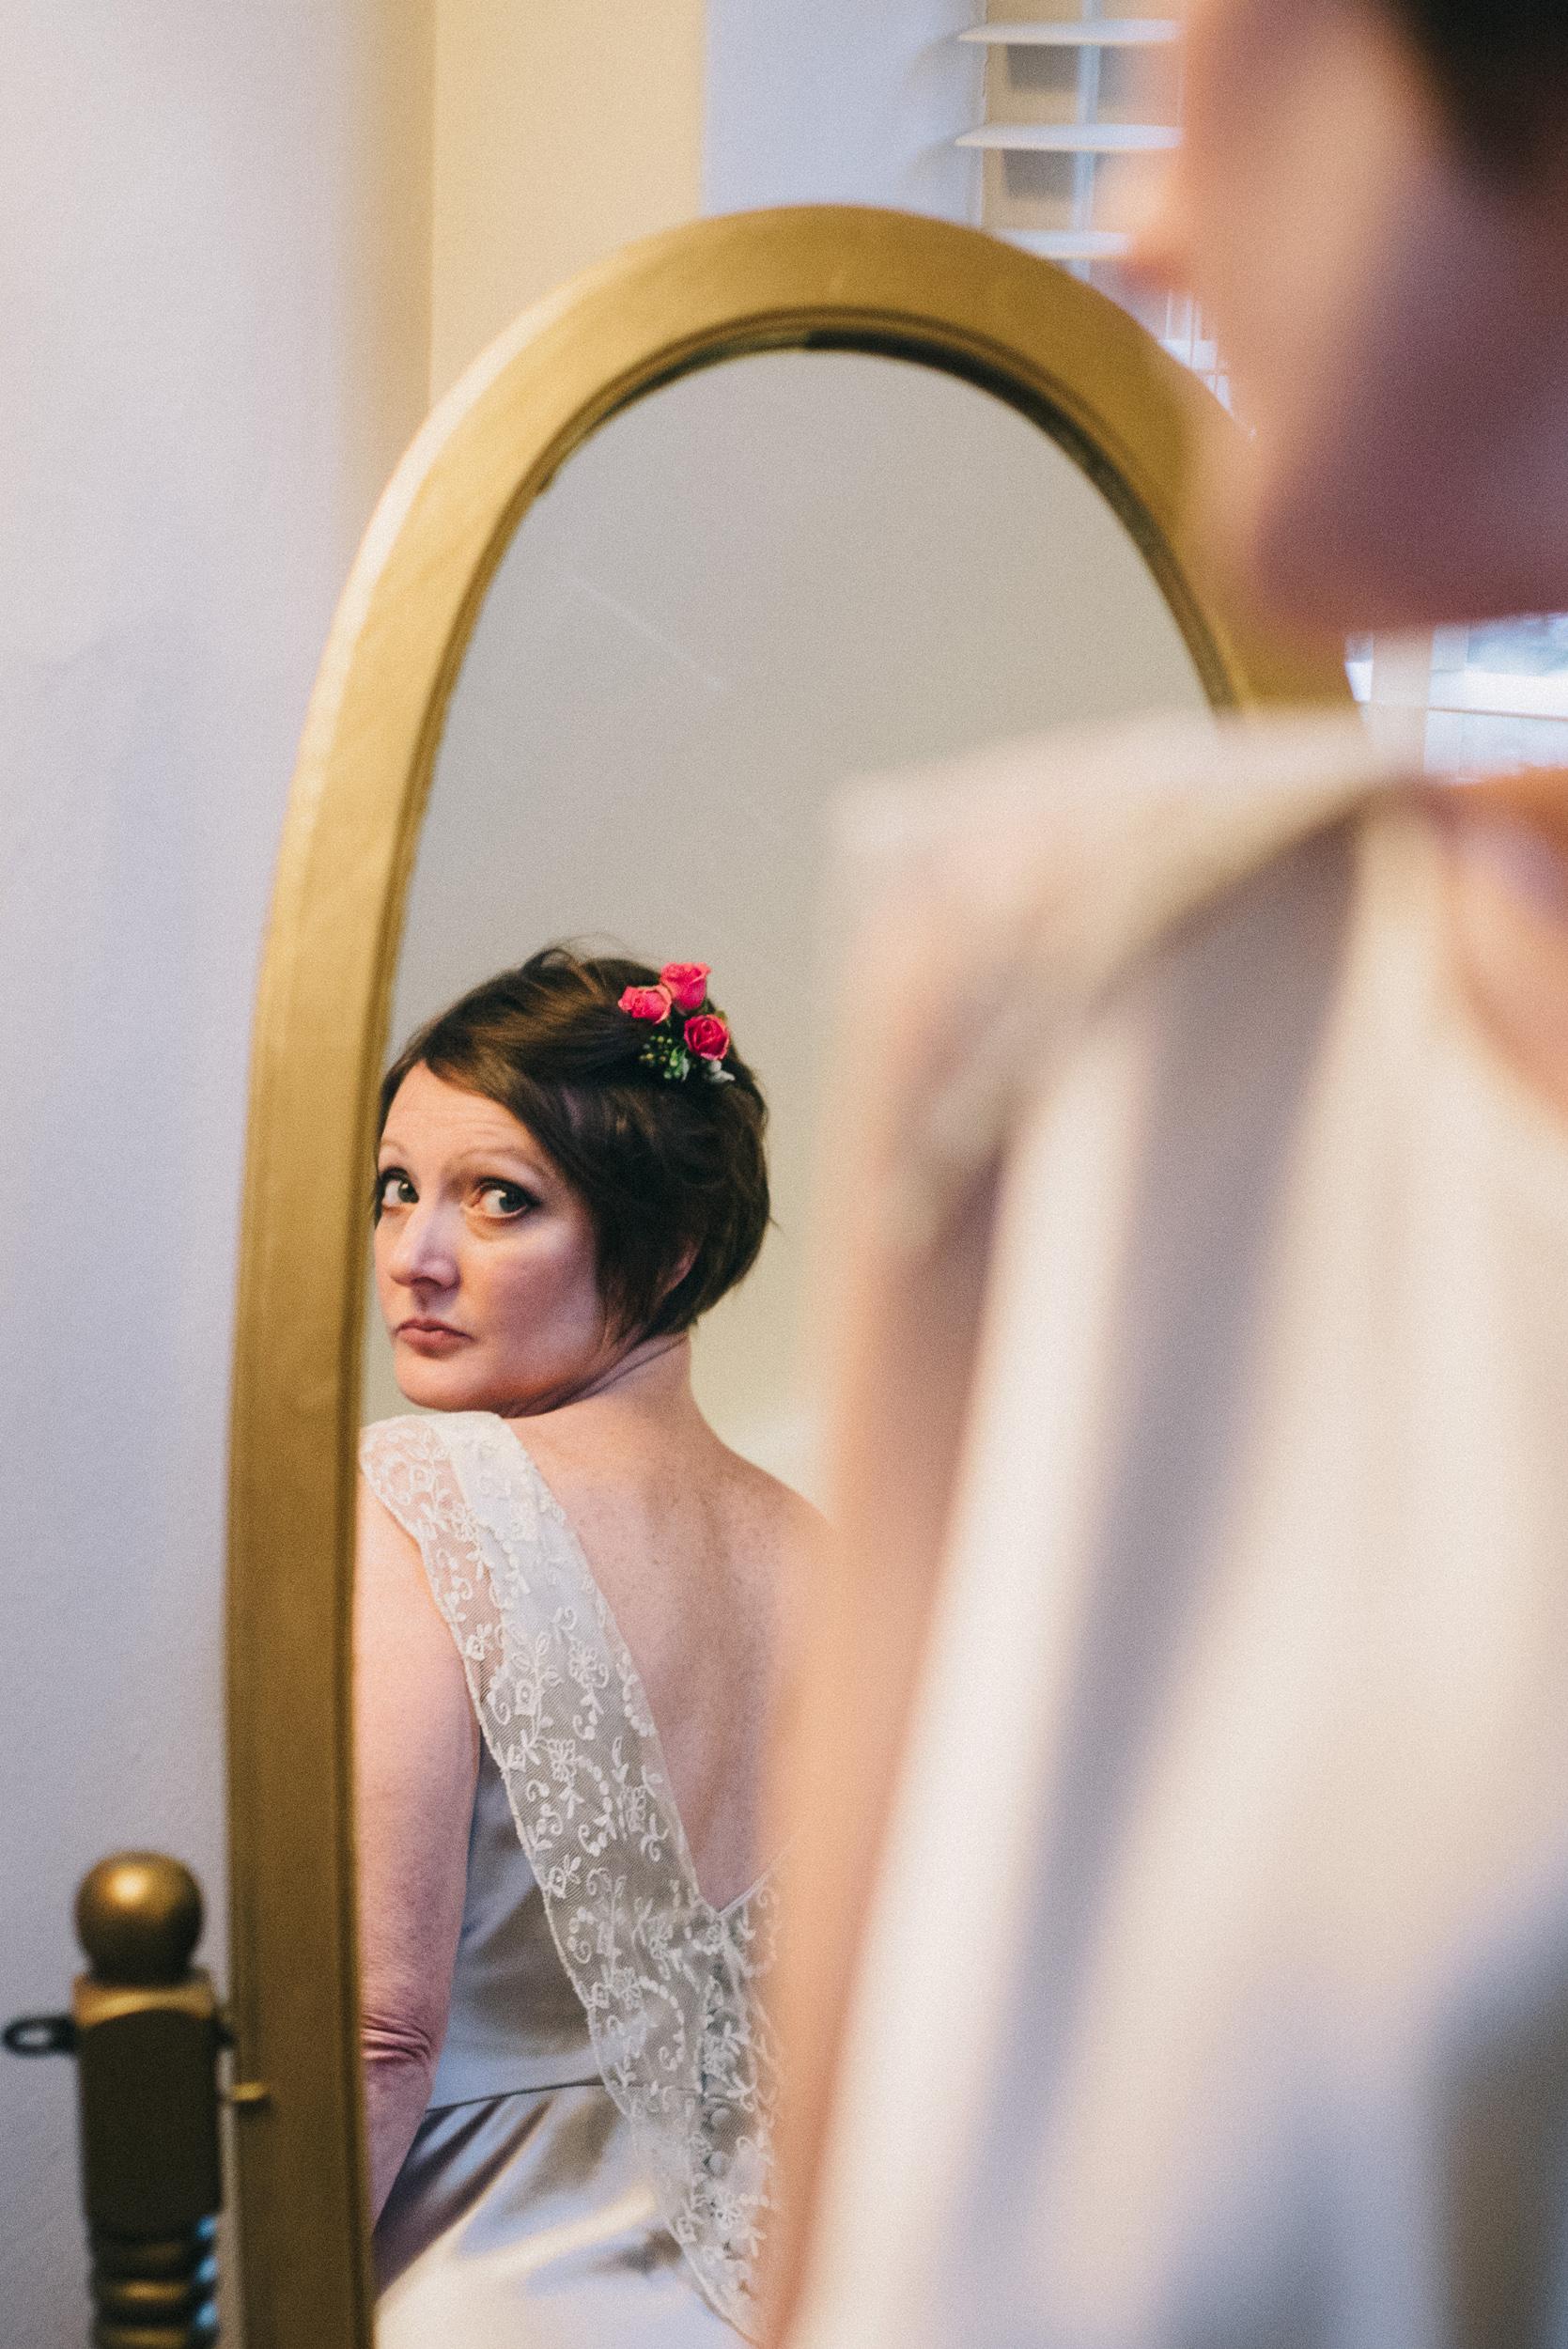 Alice-Bias-Cut-Silk-Wedding-Dress-Kate-Beaumont-Sheffield-Botanical-Gardens-by-Peakography-3.jpg